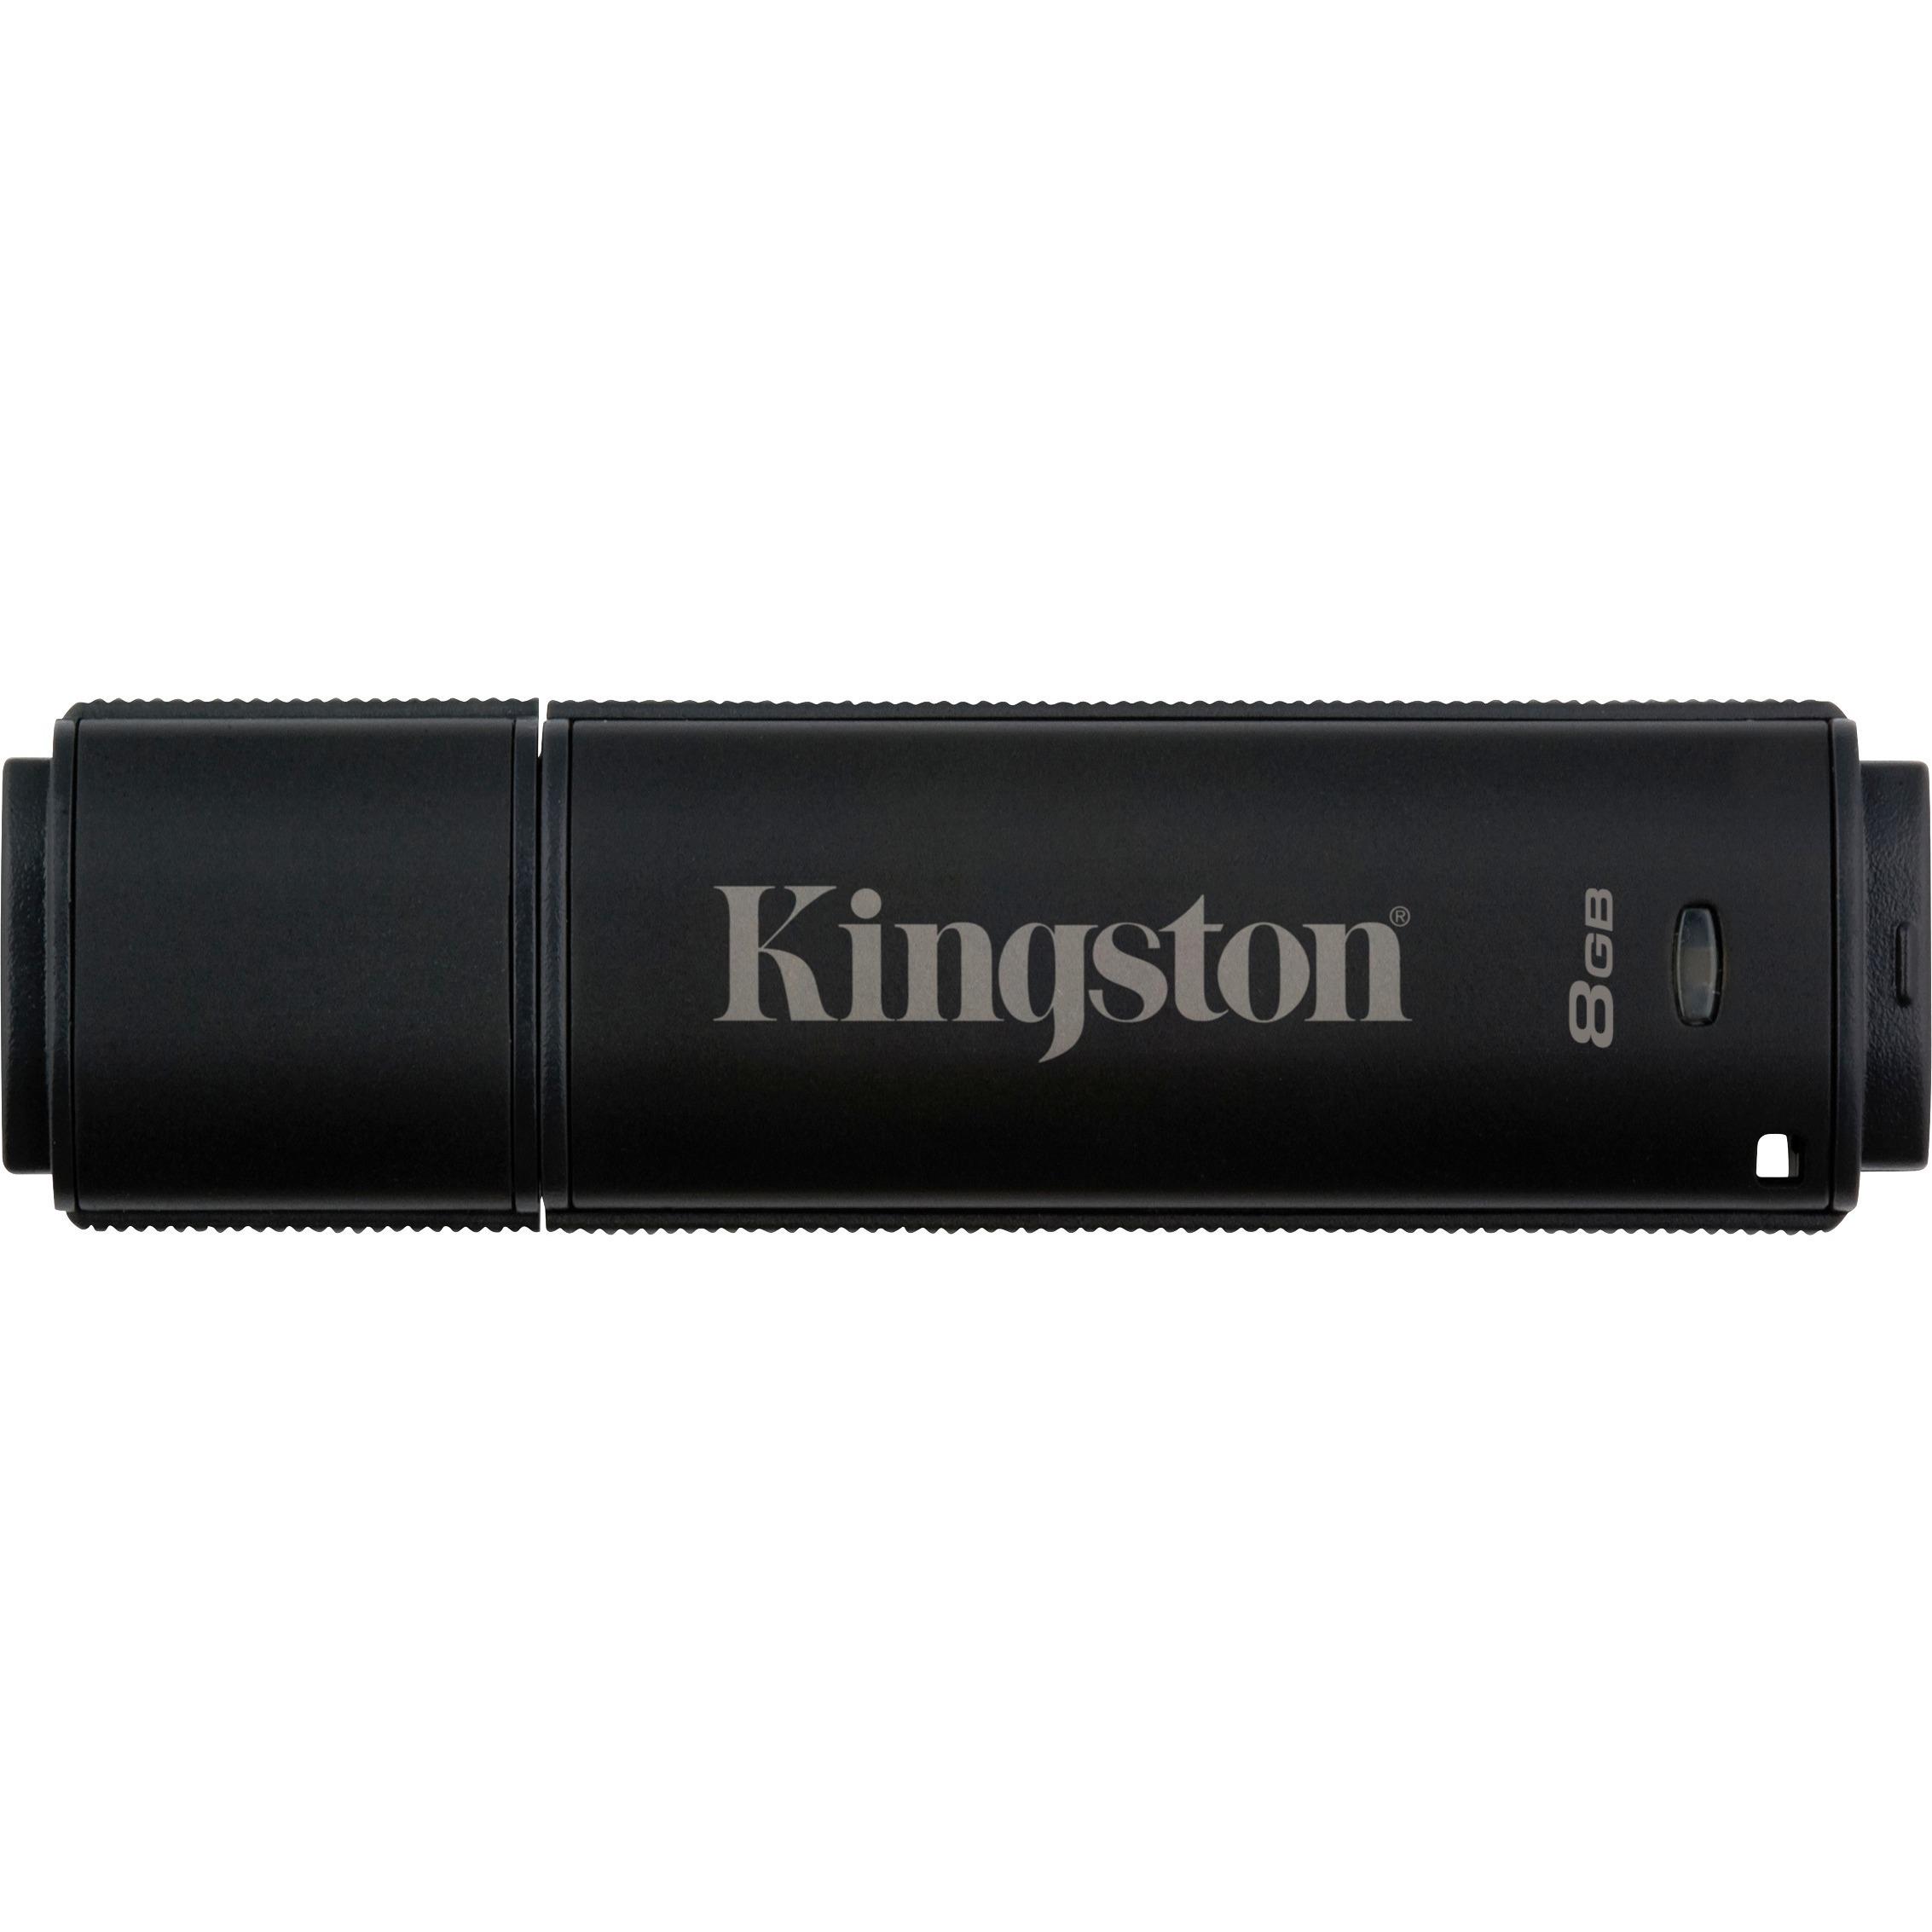 Kingston DataTraveler 4000 G2 8 GB USB 3.0 Flash Drive - 256-bit AES